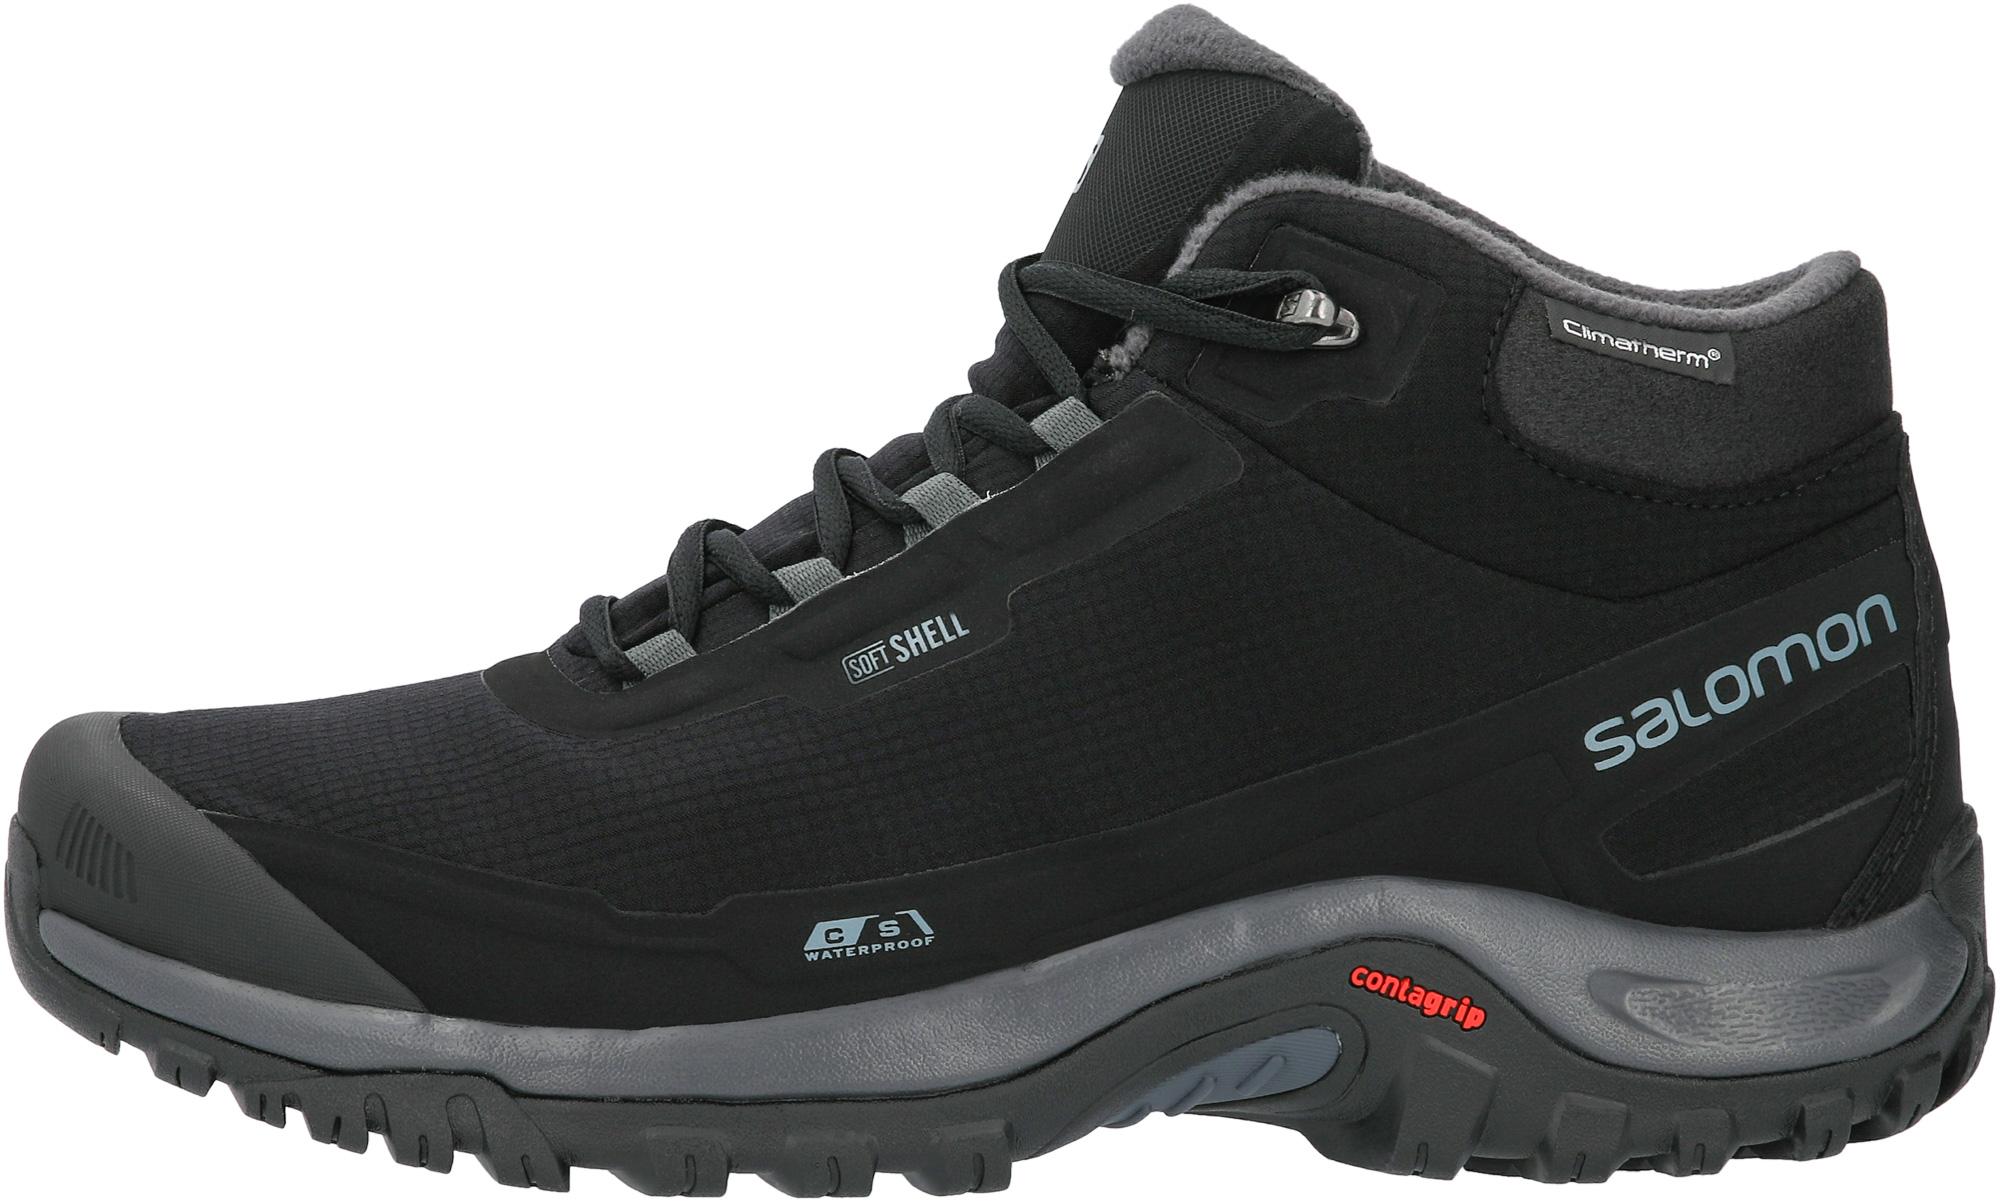 Salomon L41110400-. 12.5 Ботинки мужские утепленные SHELTER CS WP черный/серый р. 12.5, размер 39.5